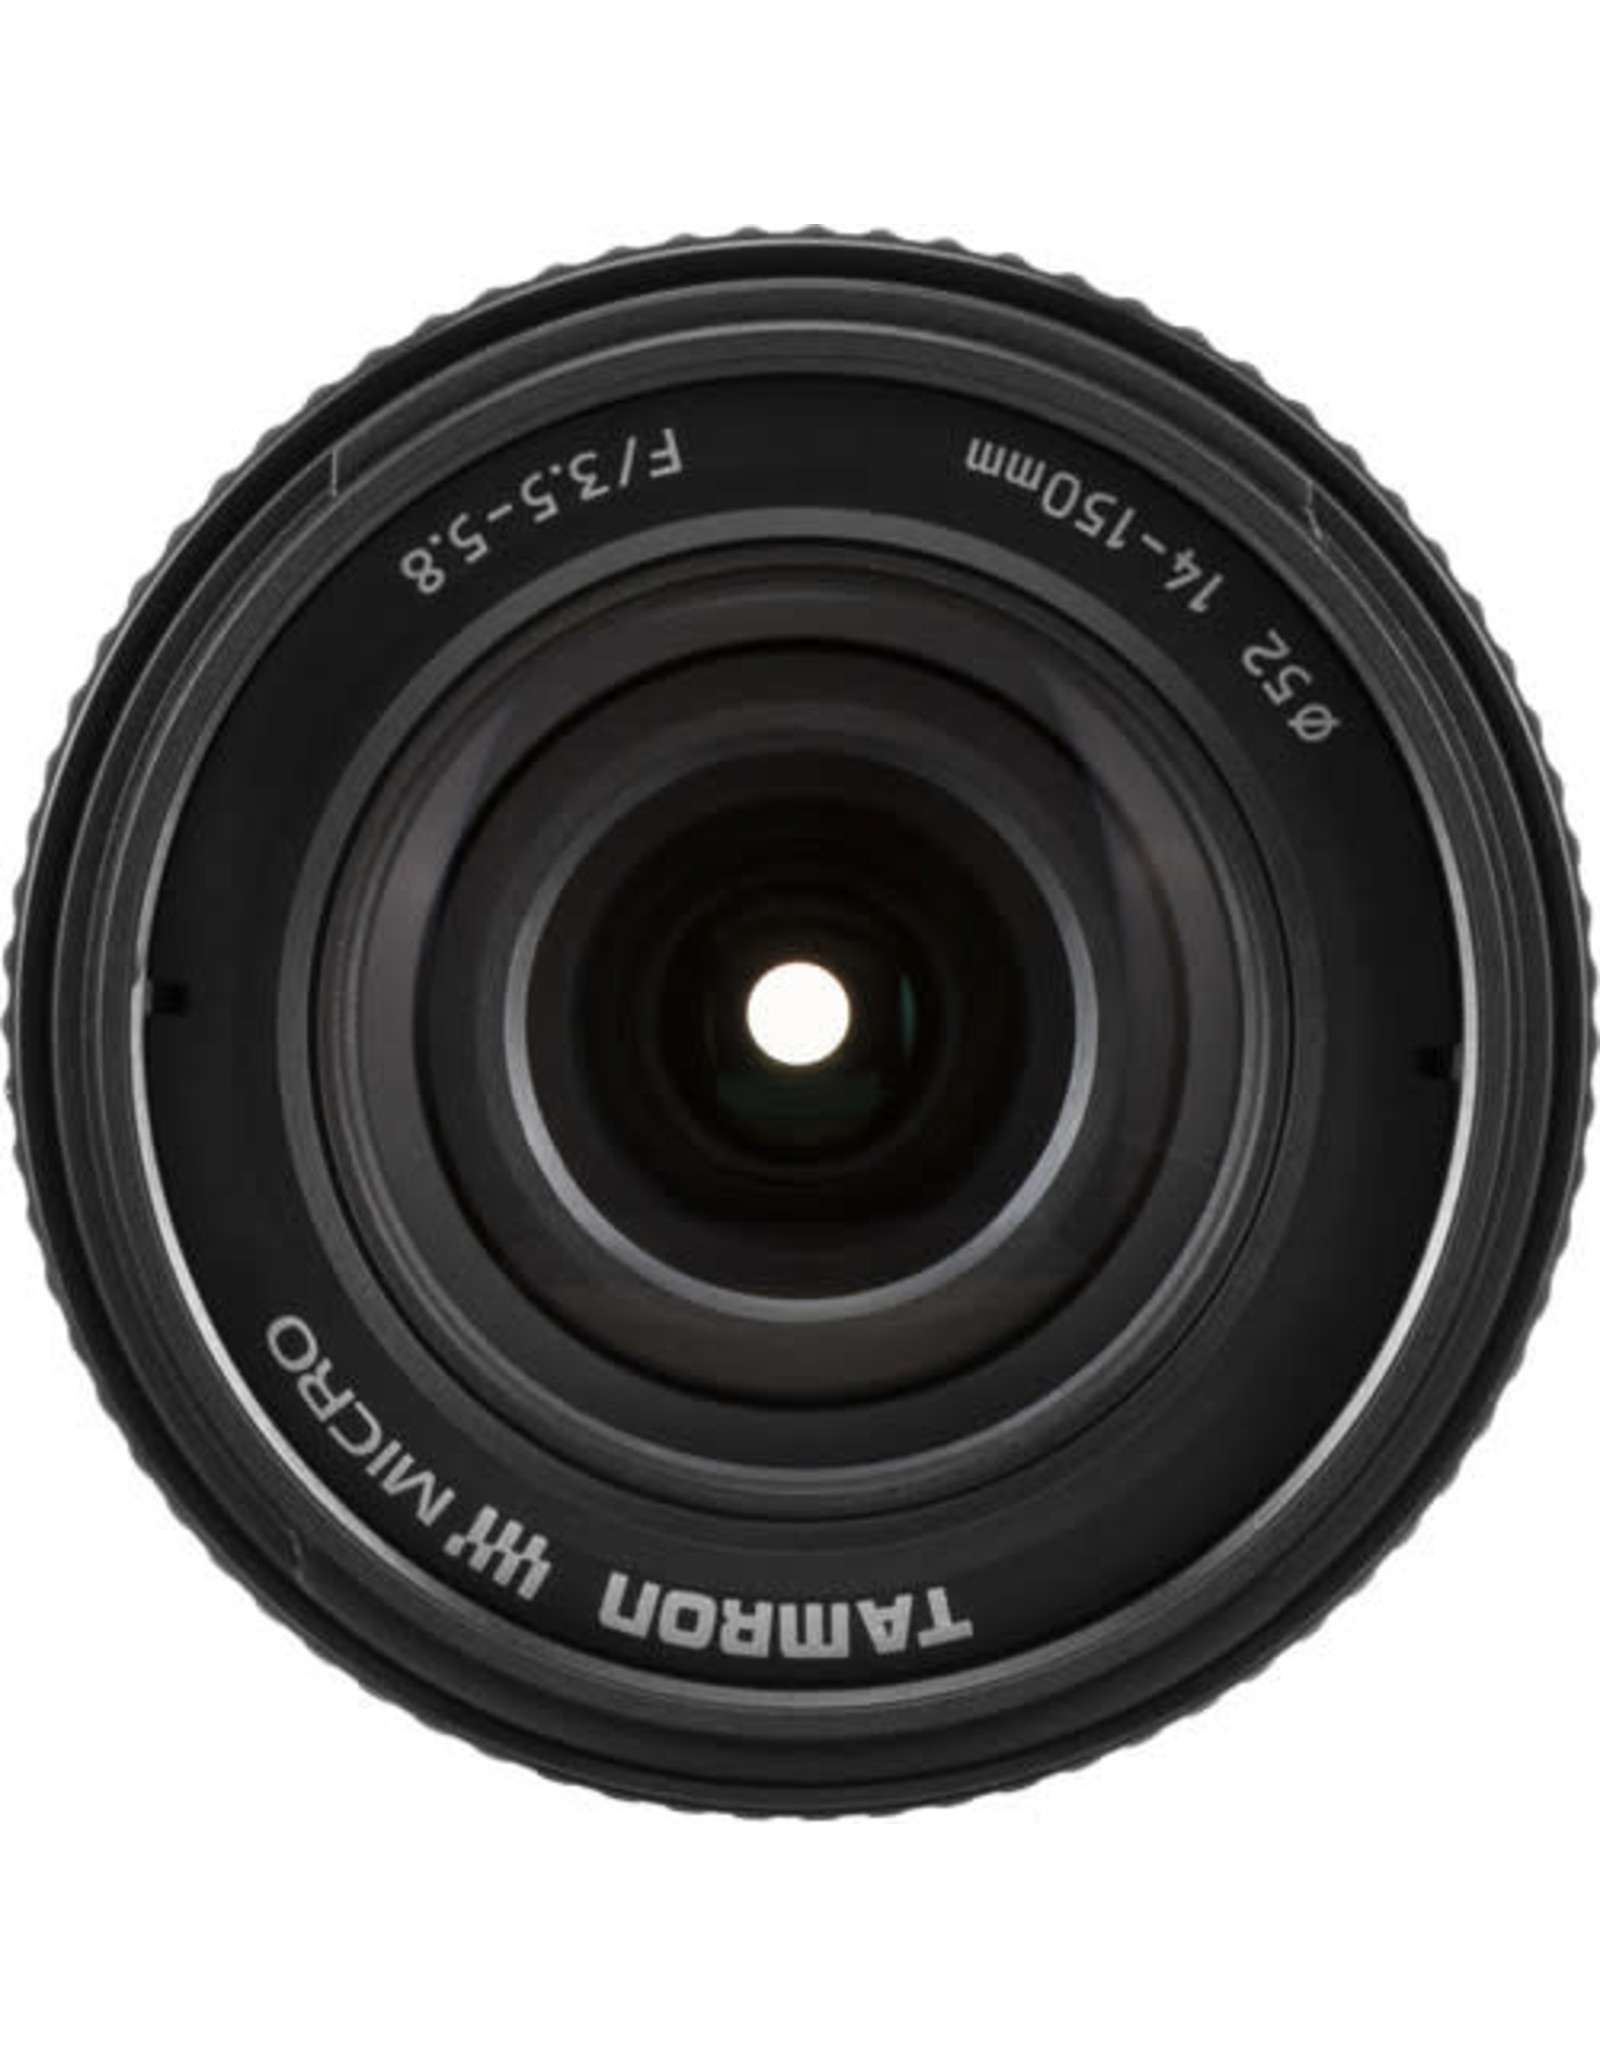 Tamron Tamron 14-150mm f/3.5-5.8 Di III Lens for Micro Four Thirds (Black)